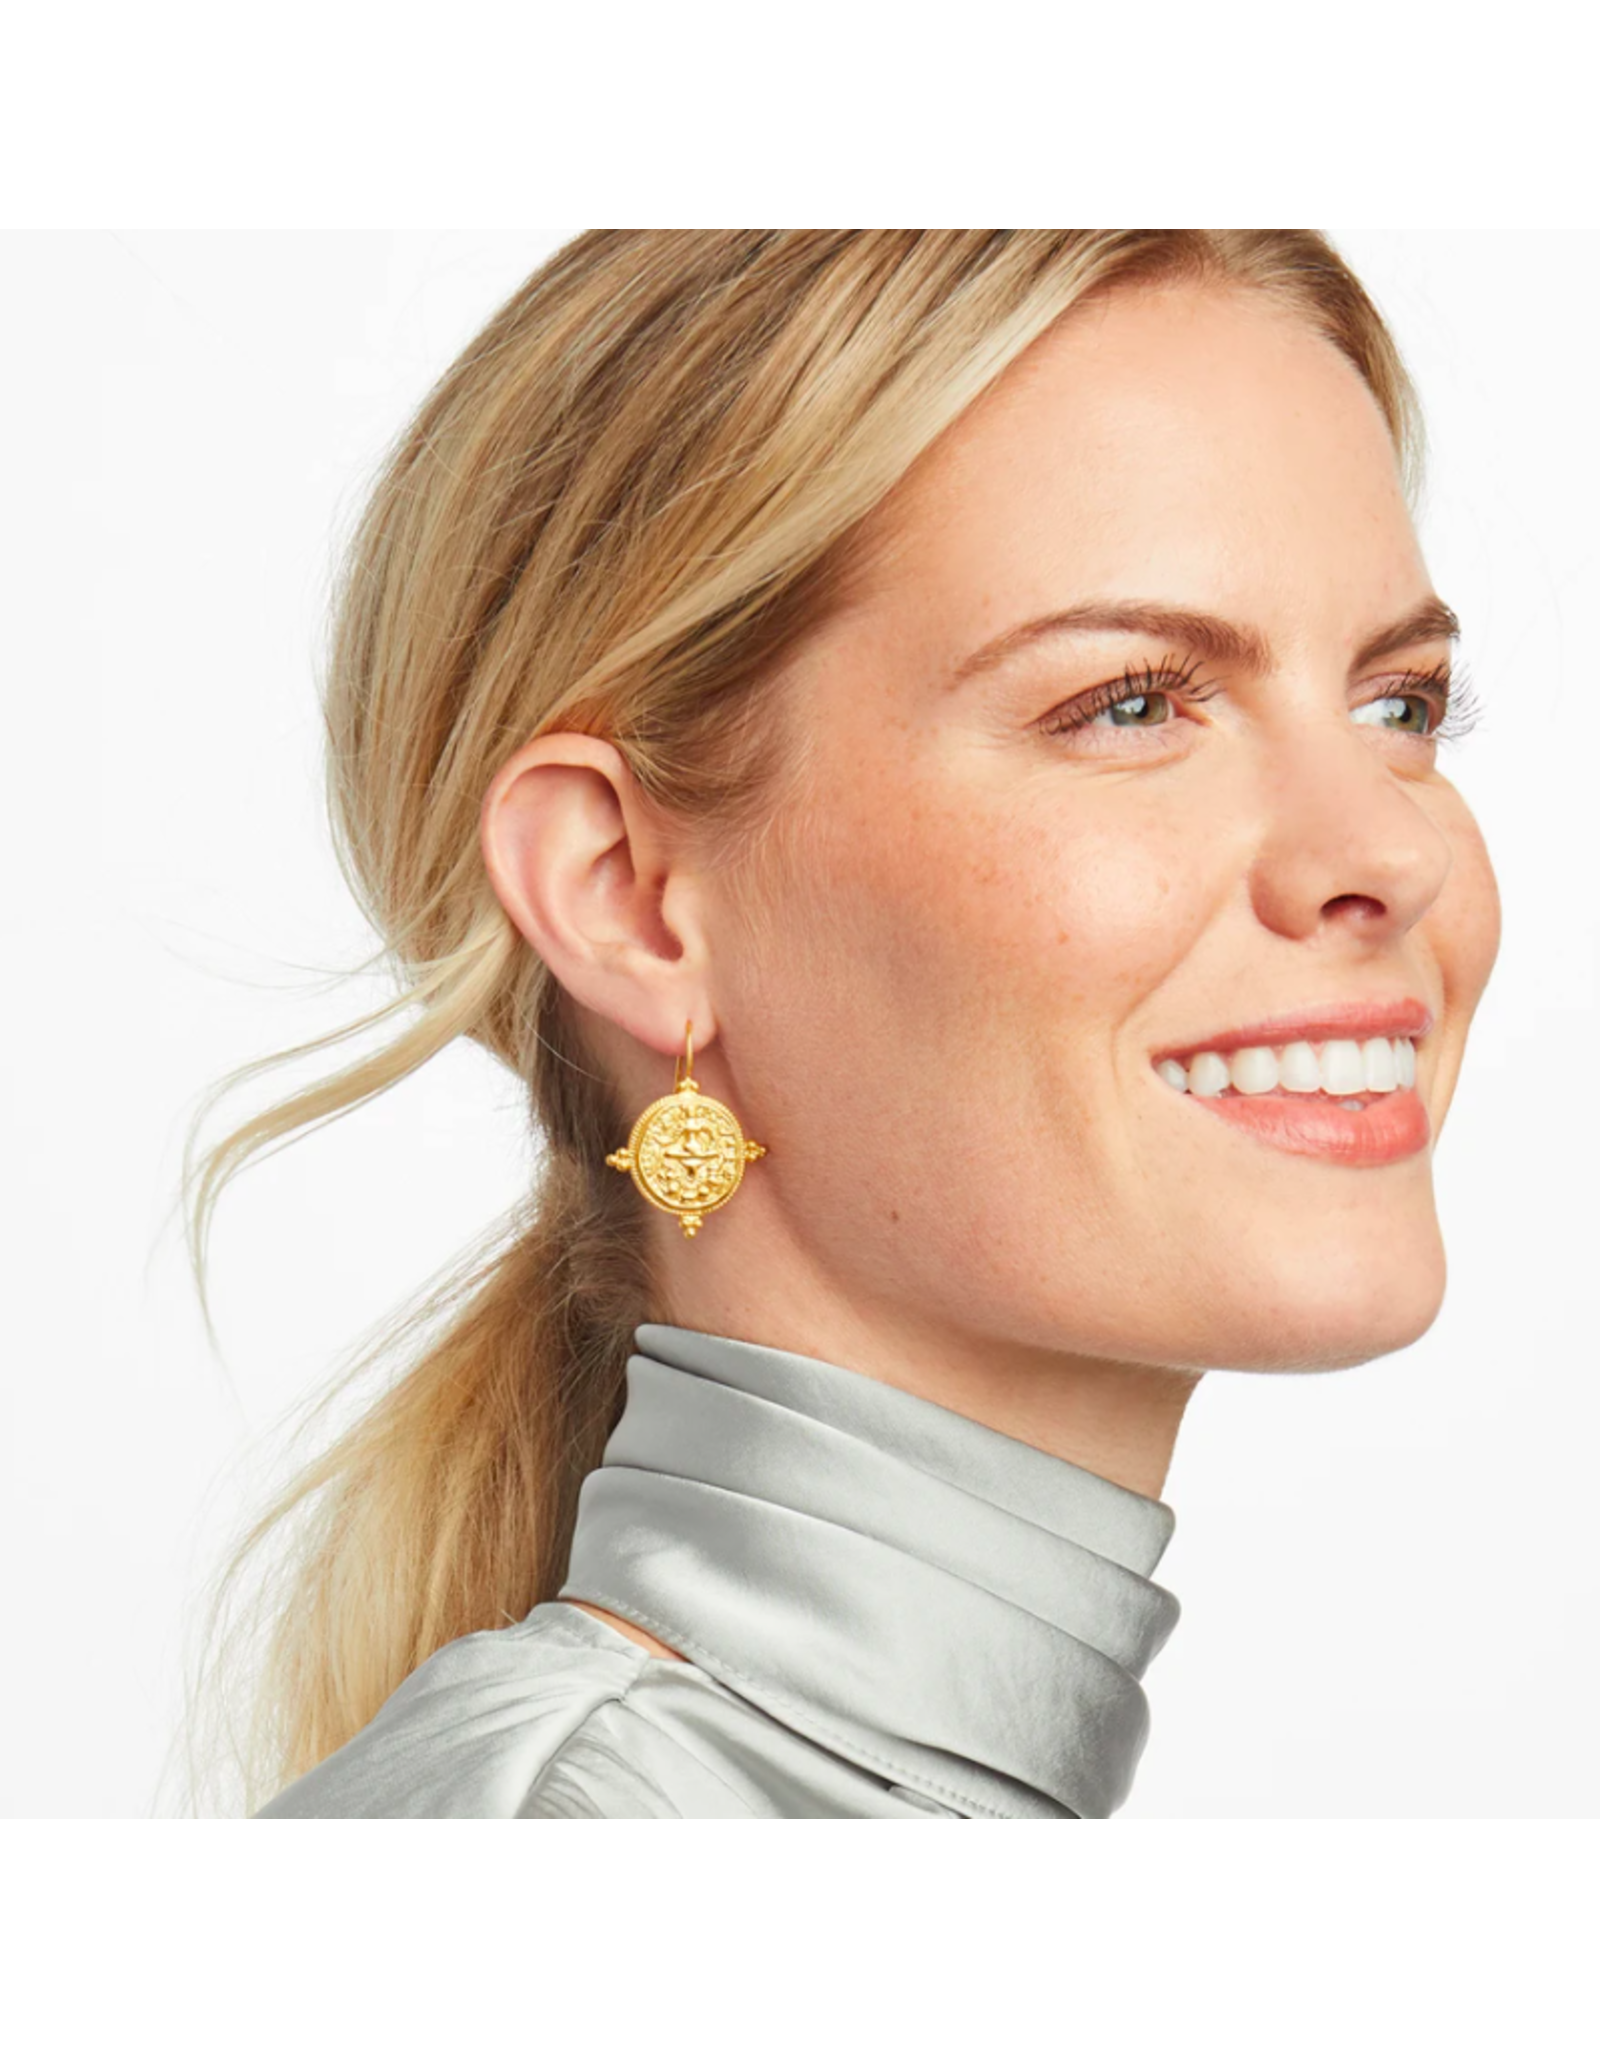 Julie Vos Quatro Coin Earring by Julie Vos